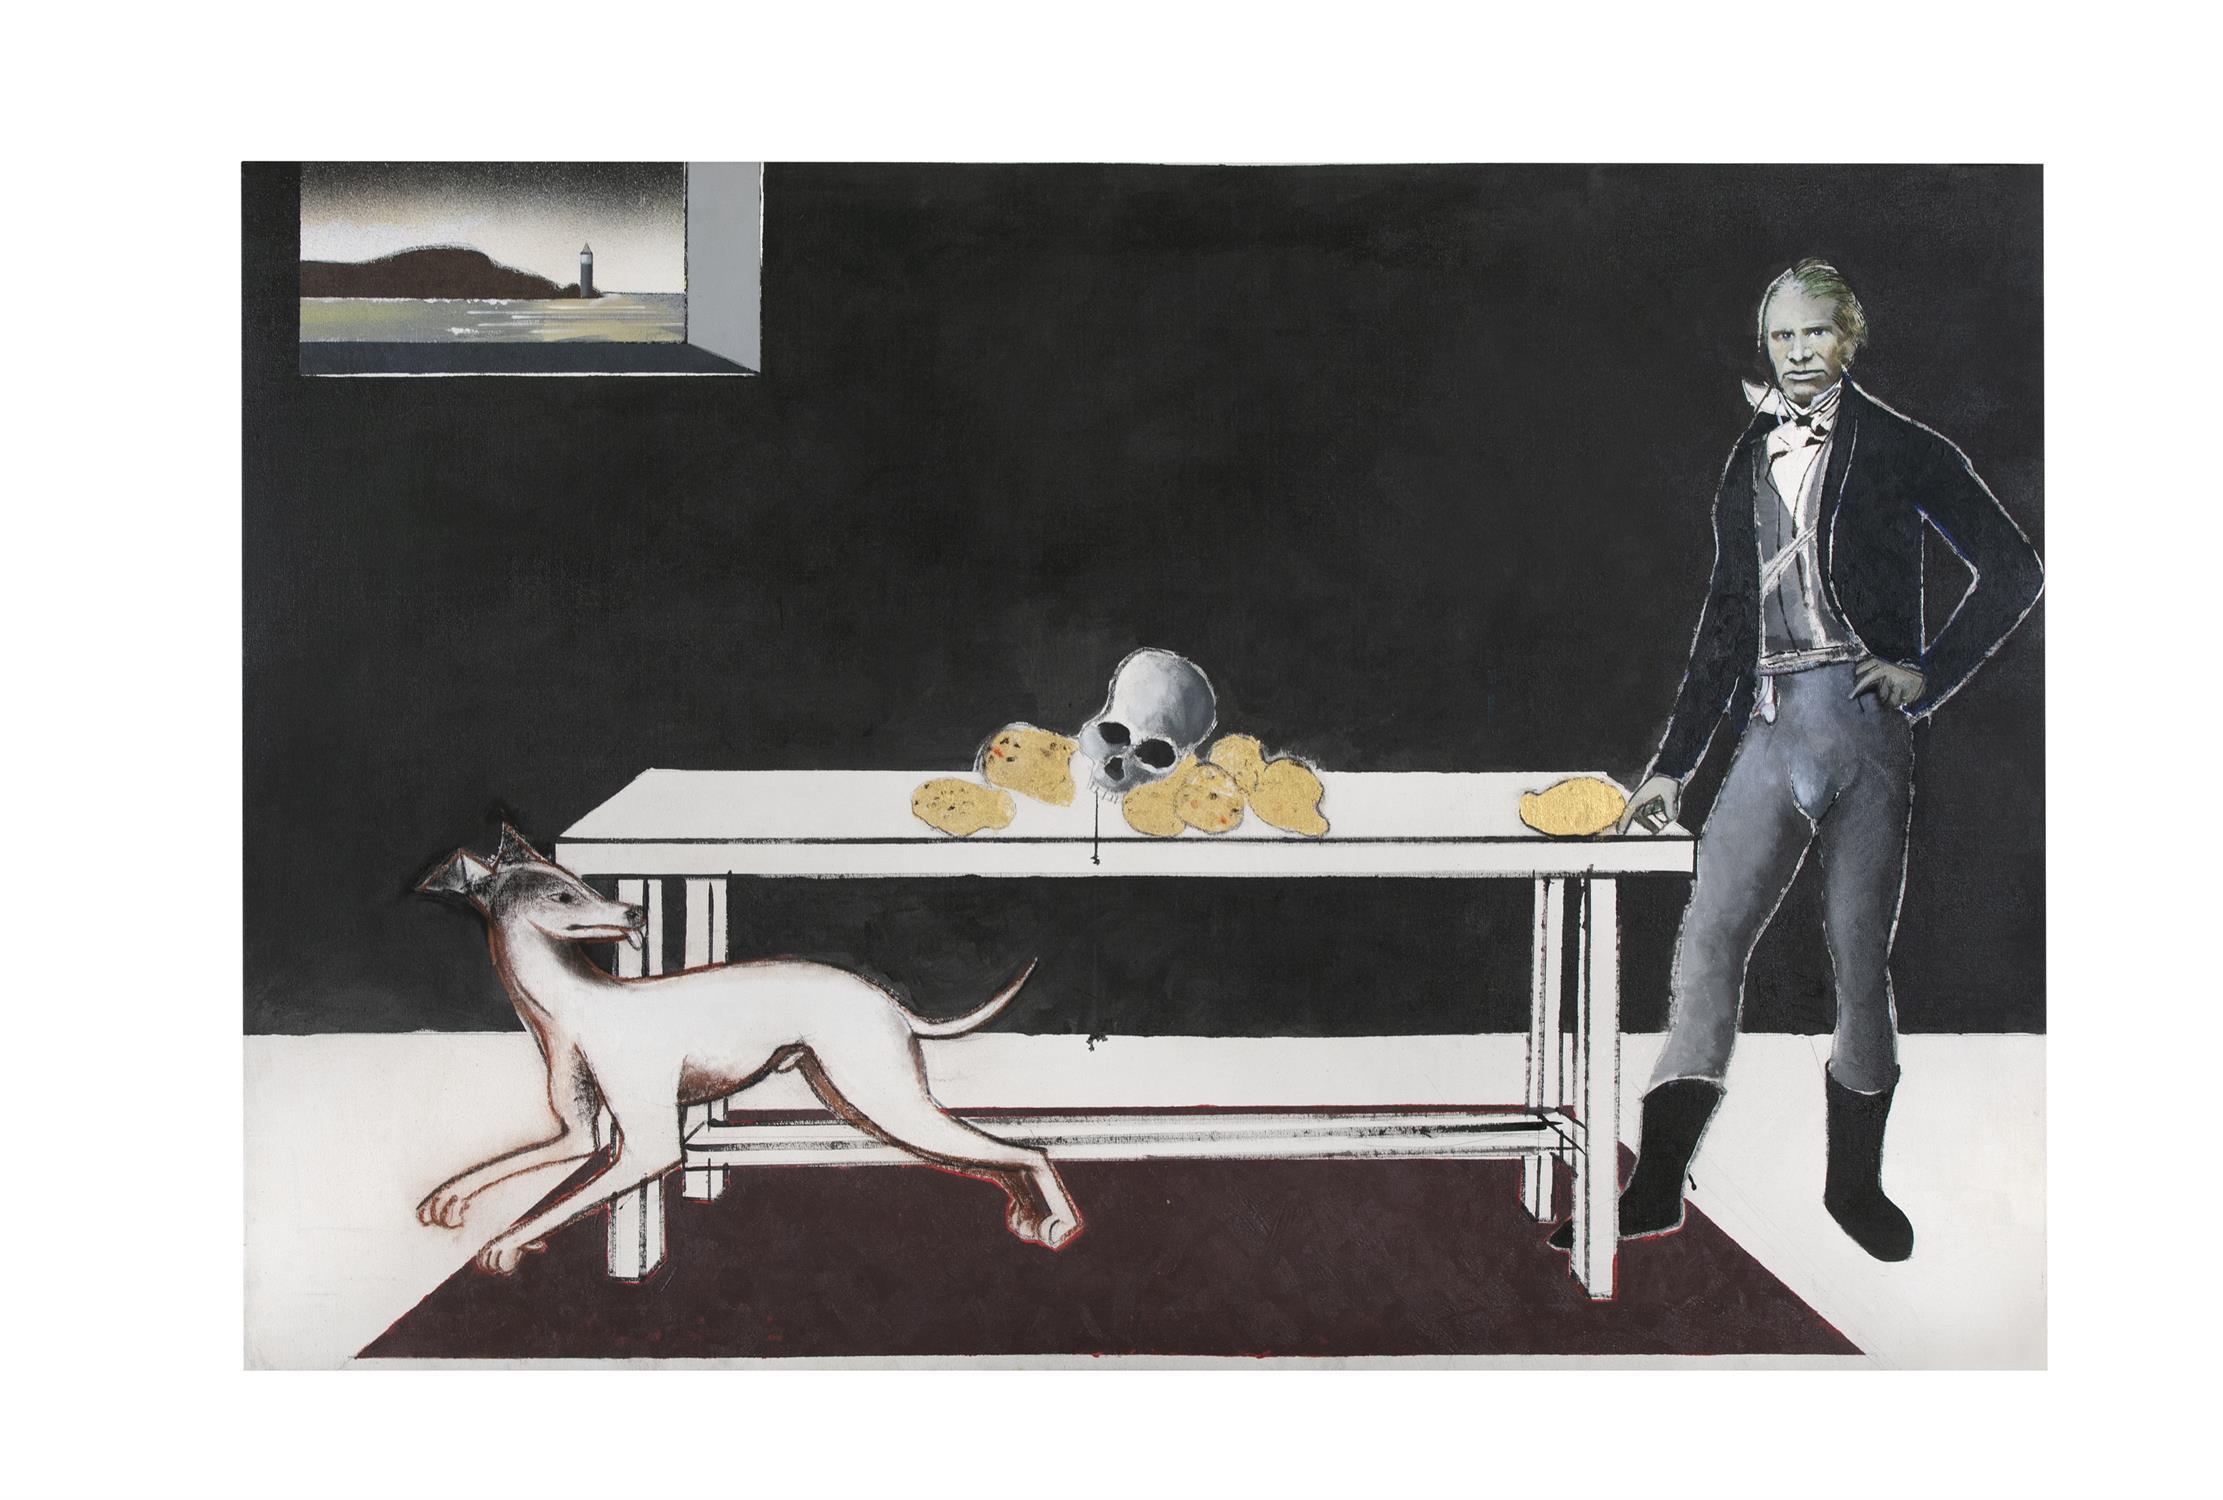 Michael Farrell (1940-2000) Nature Morte Irlande 1846 Oil on canvas, 114 x 167cm (44¾ x